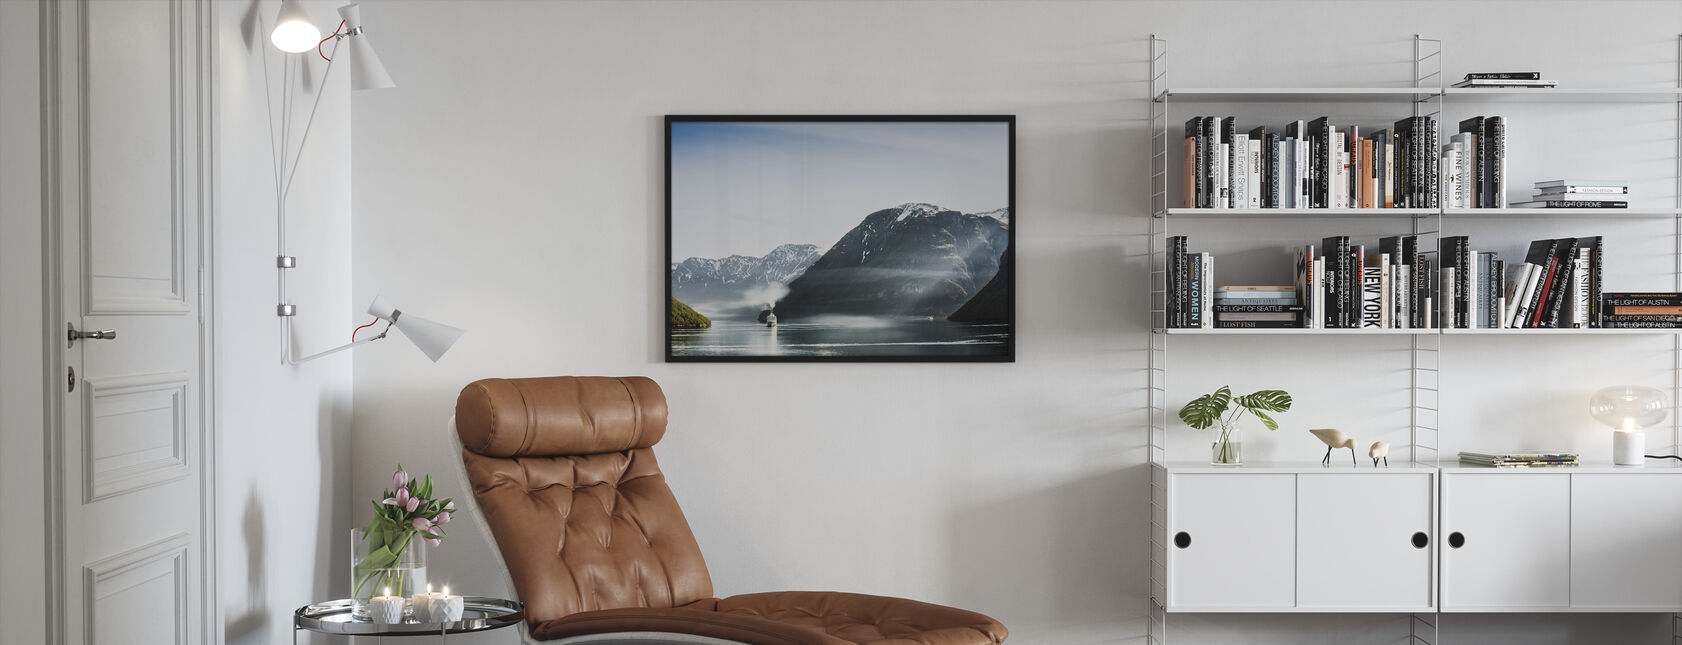 Cruise Boat Passes Geiranger Fjord, Norway - Framed print - Living Room